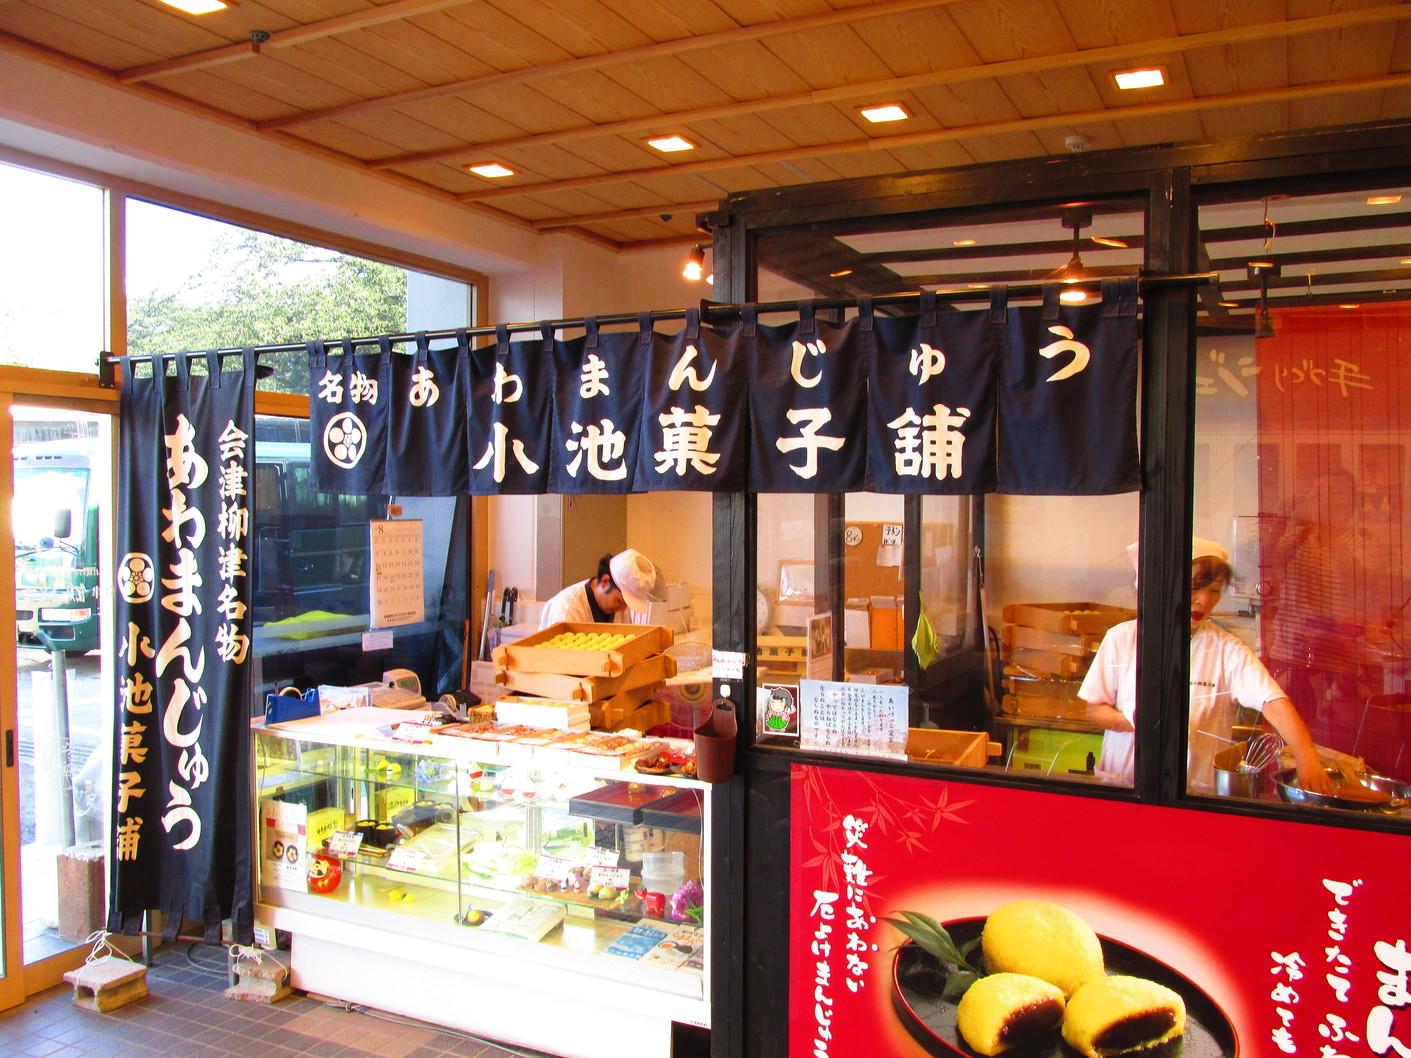 小池菓子舗 鶴ヶ城店